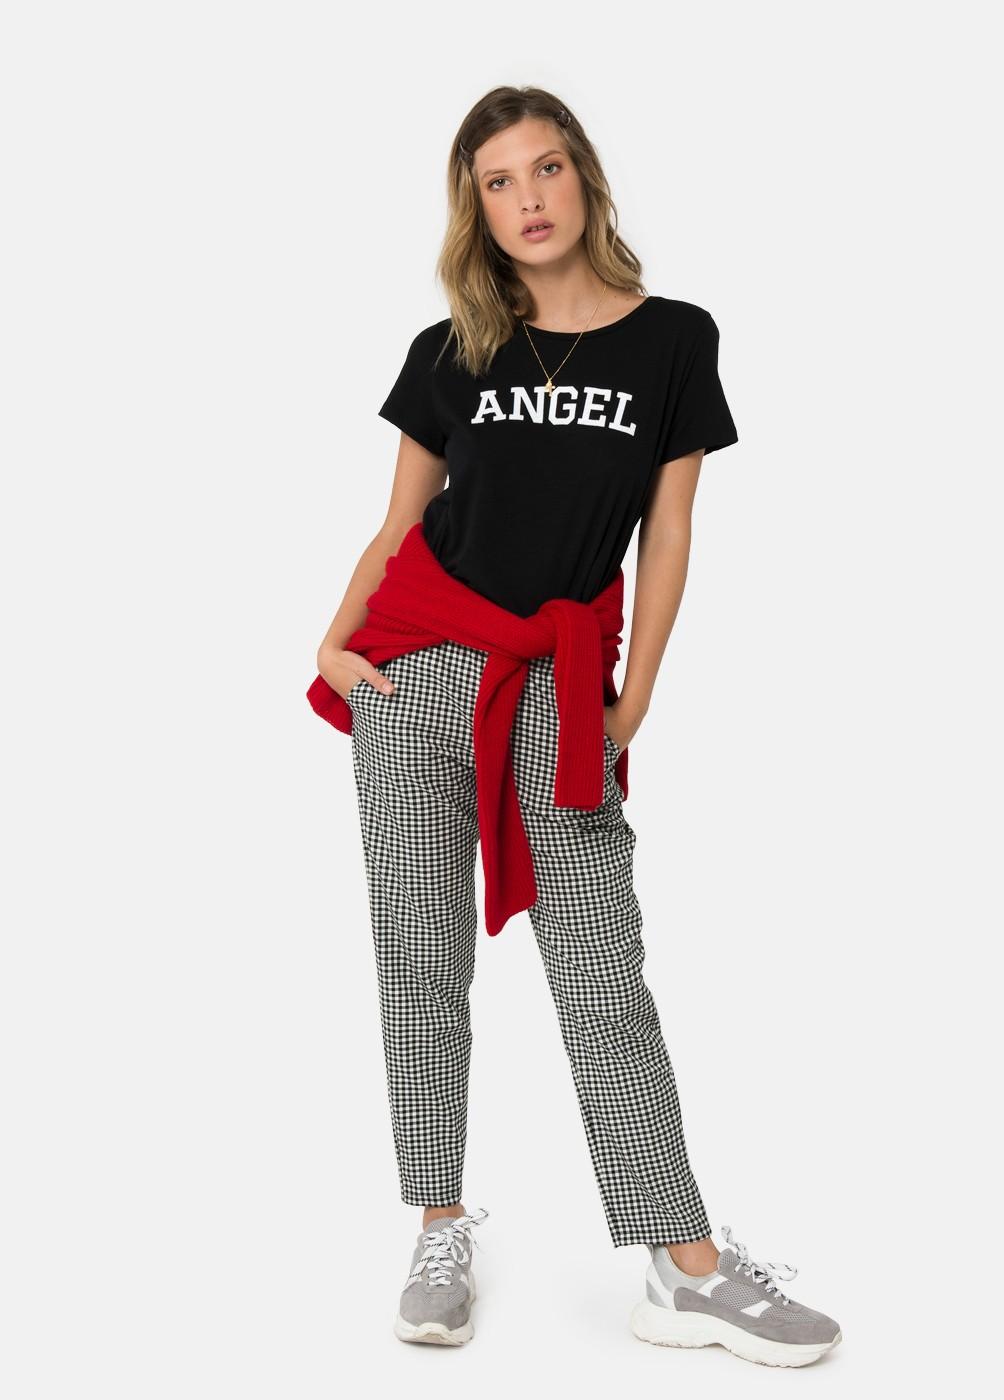 CAMISETA ANGEL BLACK